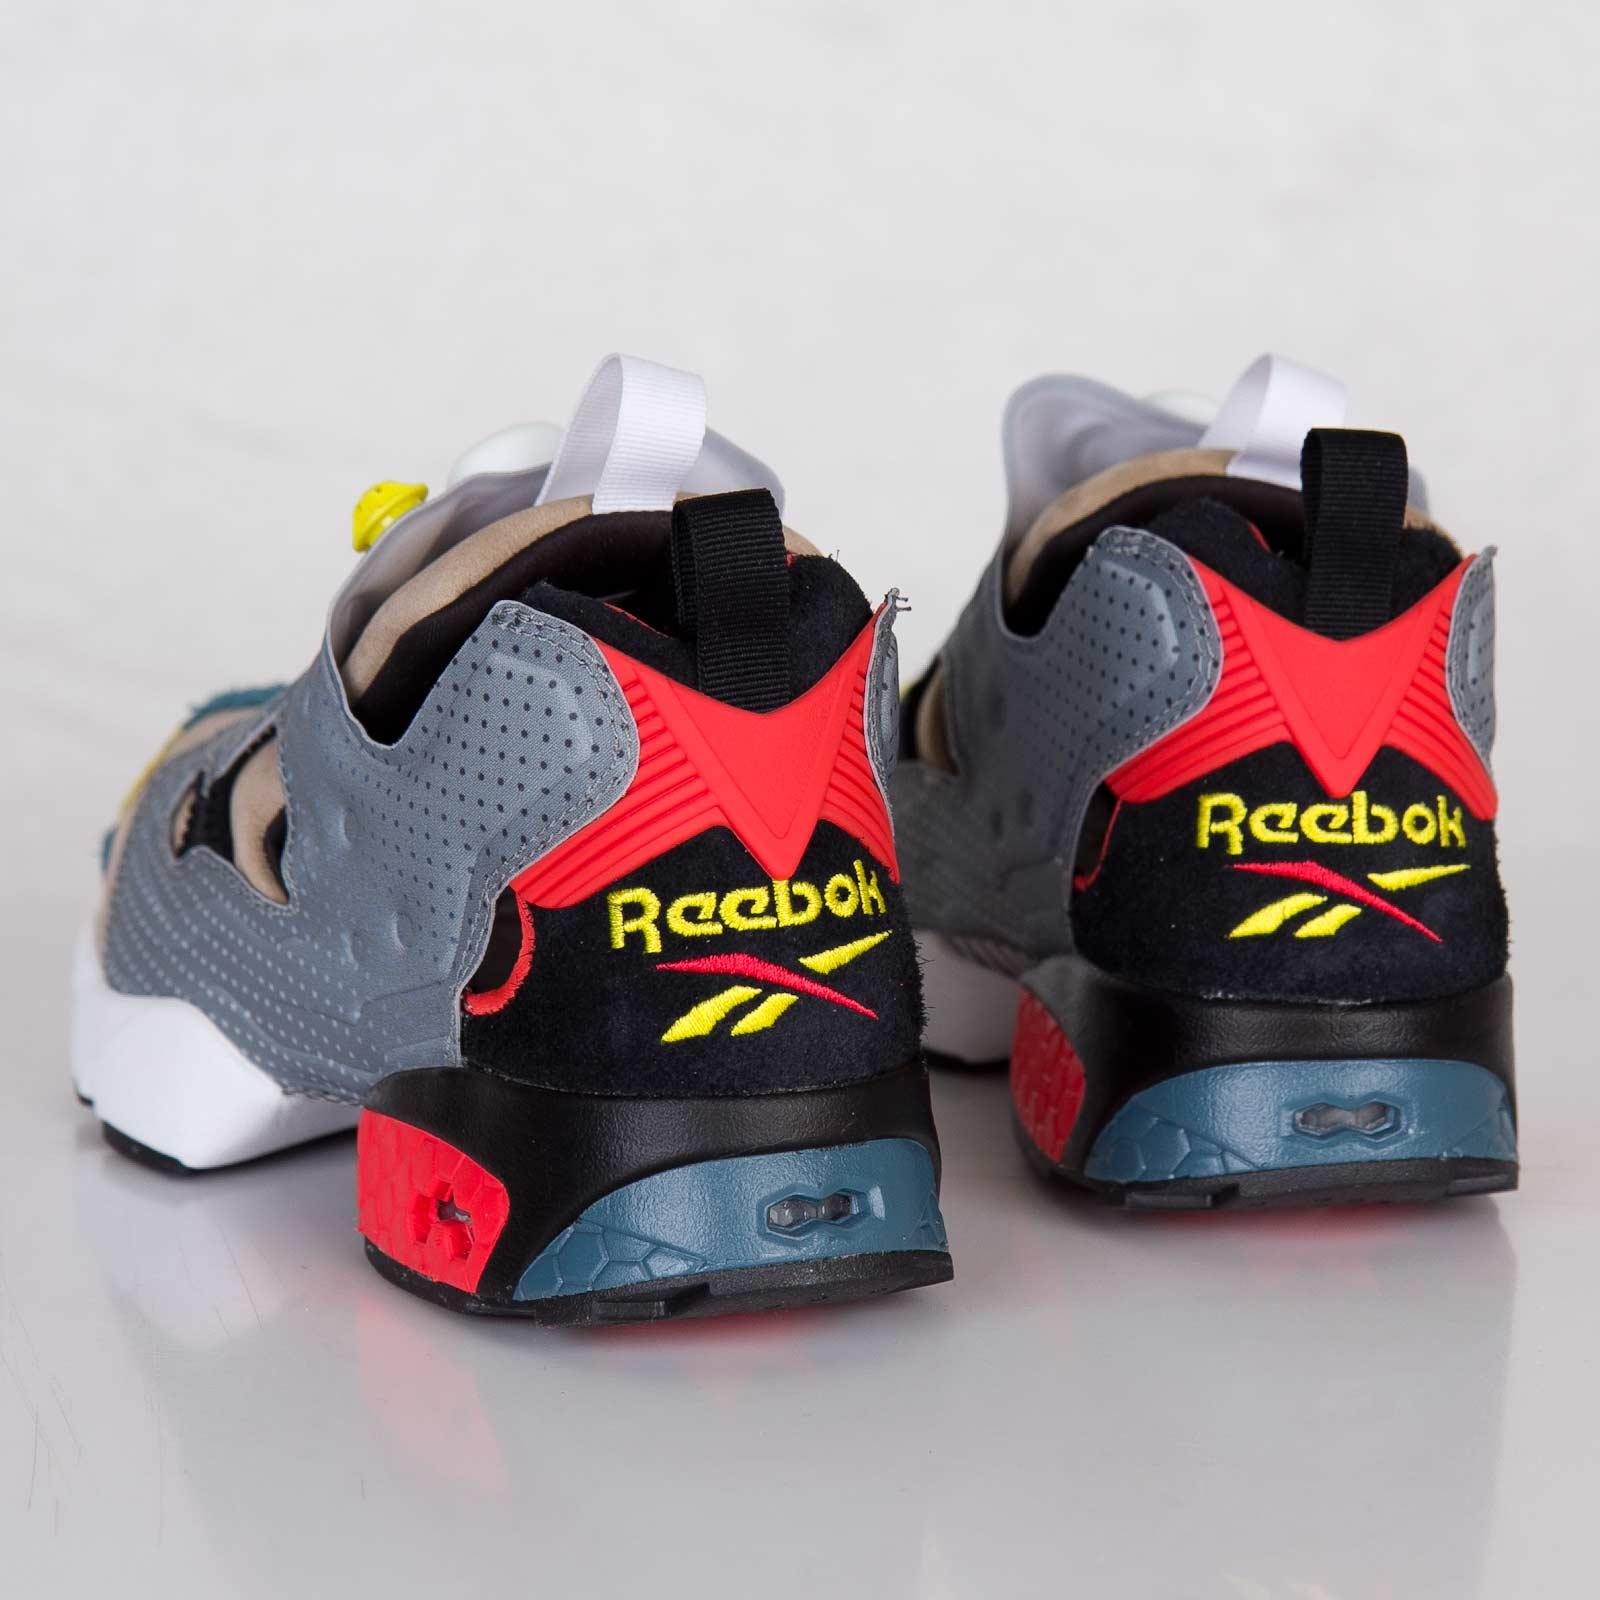 Reebok Instapump Fury OG - V61330 - Sneakersnstuff  4e7cb2e422